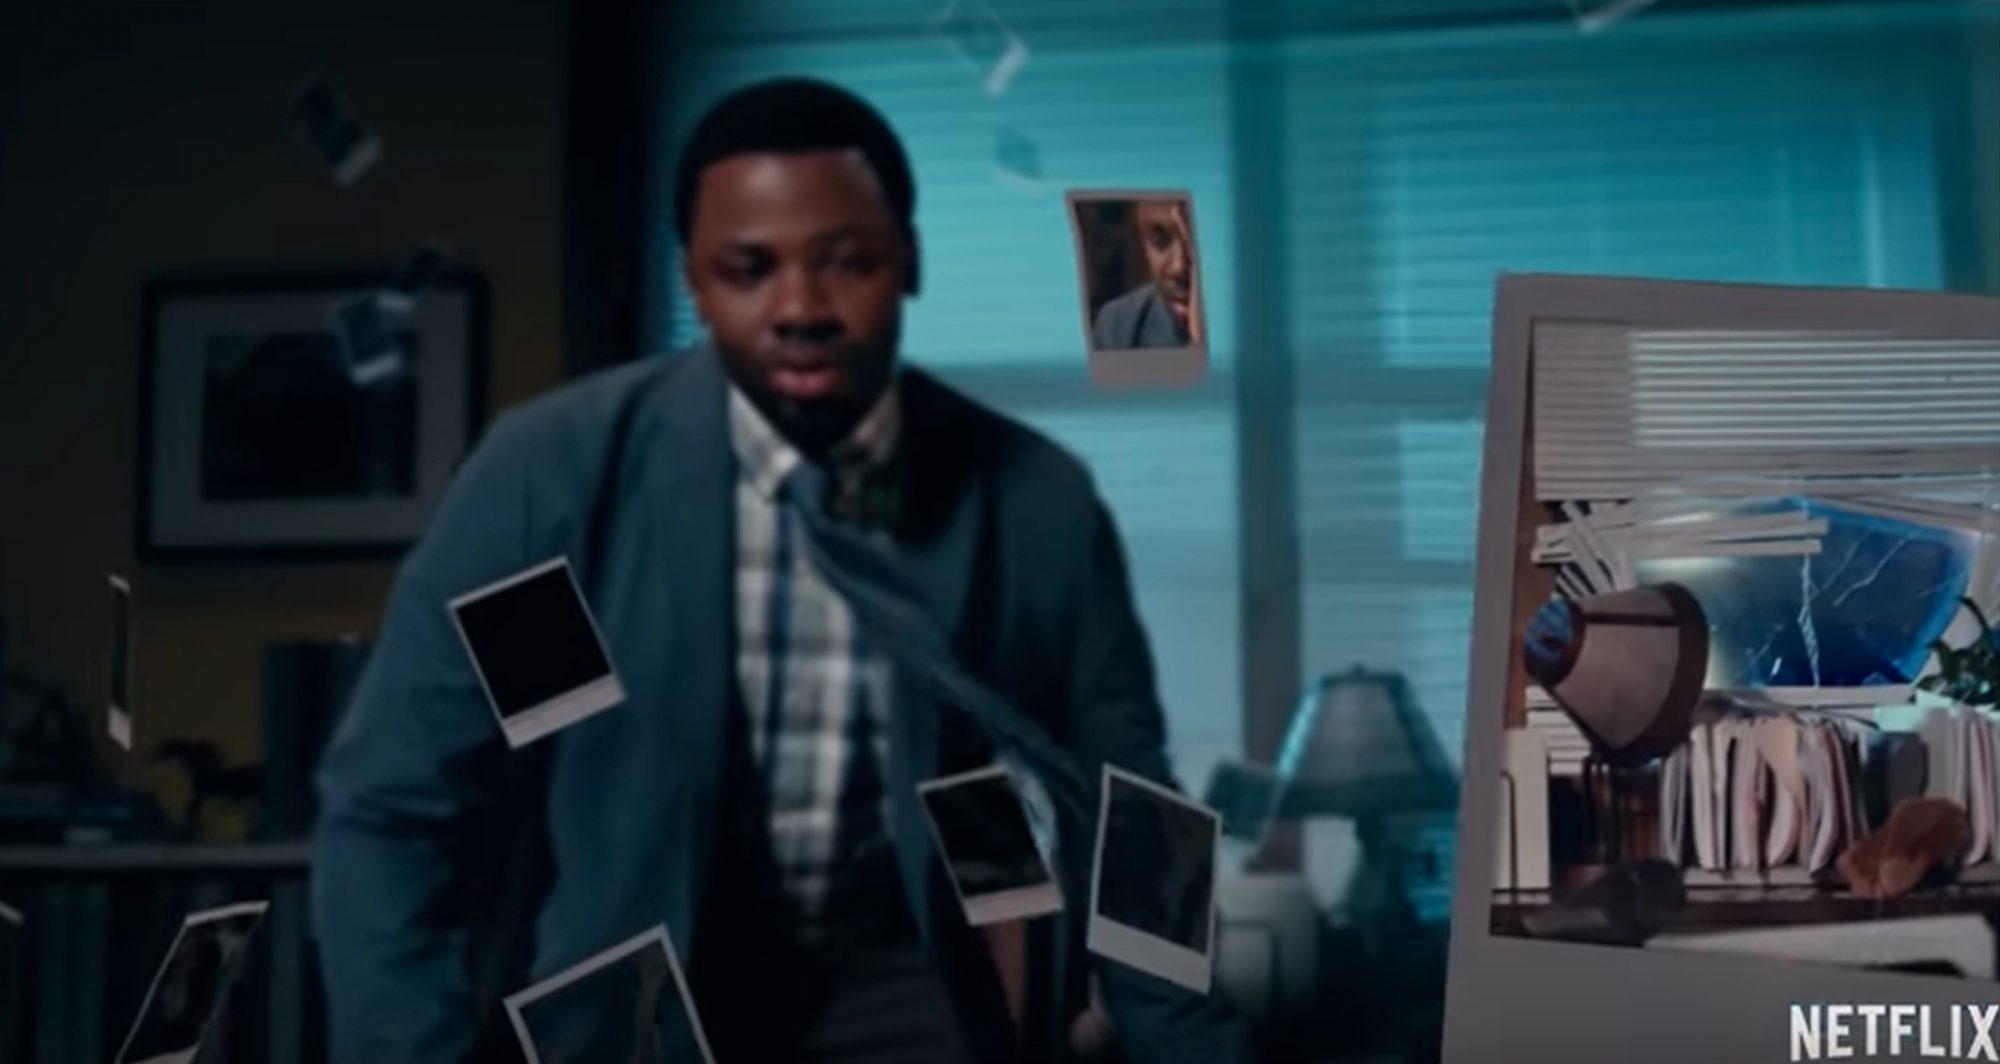 13 Reasons Why TrailerCredit: Netflix